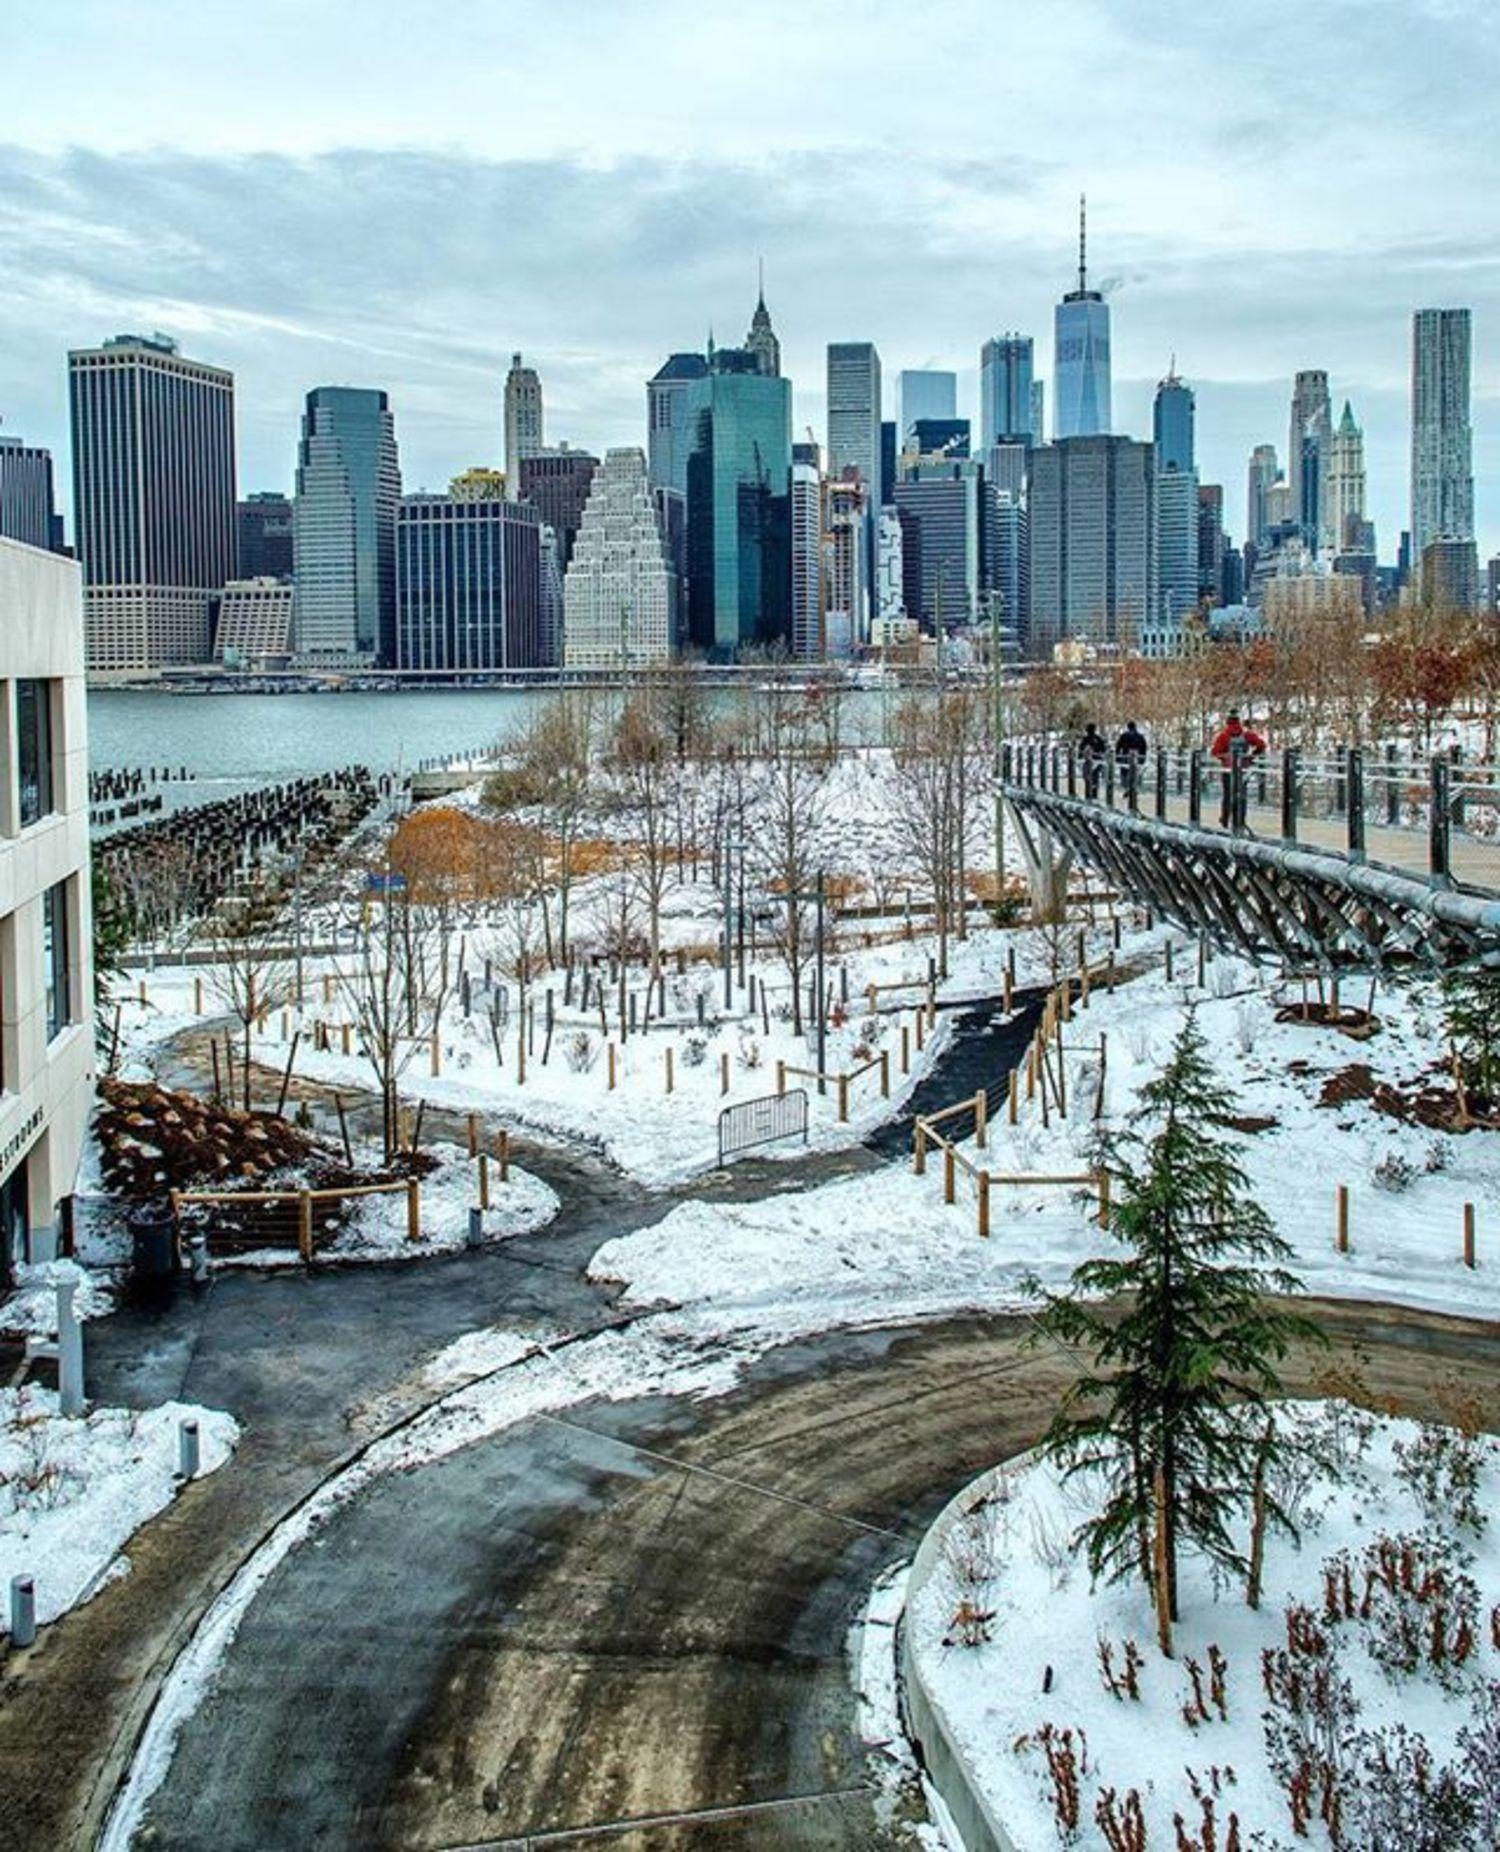 New York, New York. Photo via @ericknyc_ #viewingnyc #newyorkcity #newyork #nyc #snow